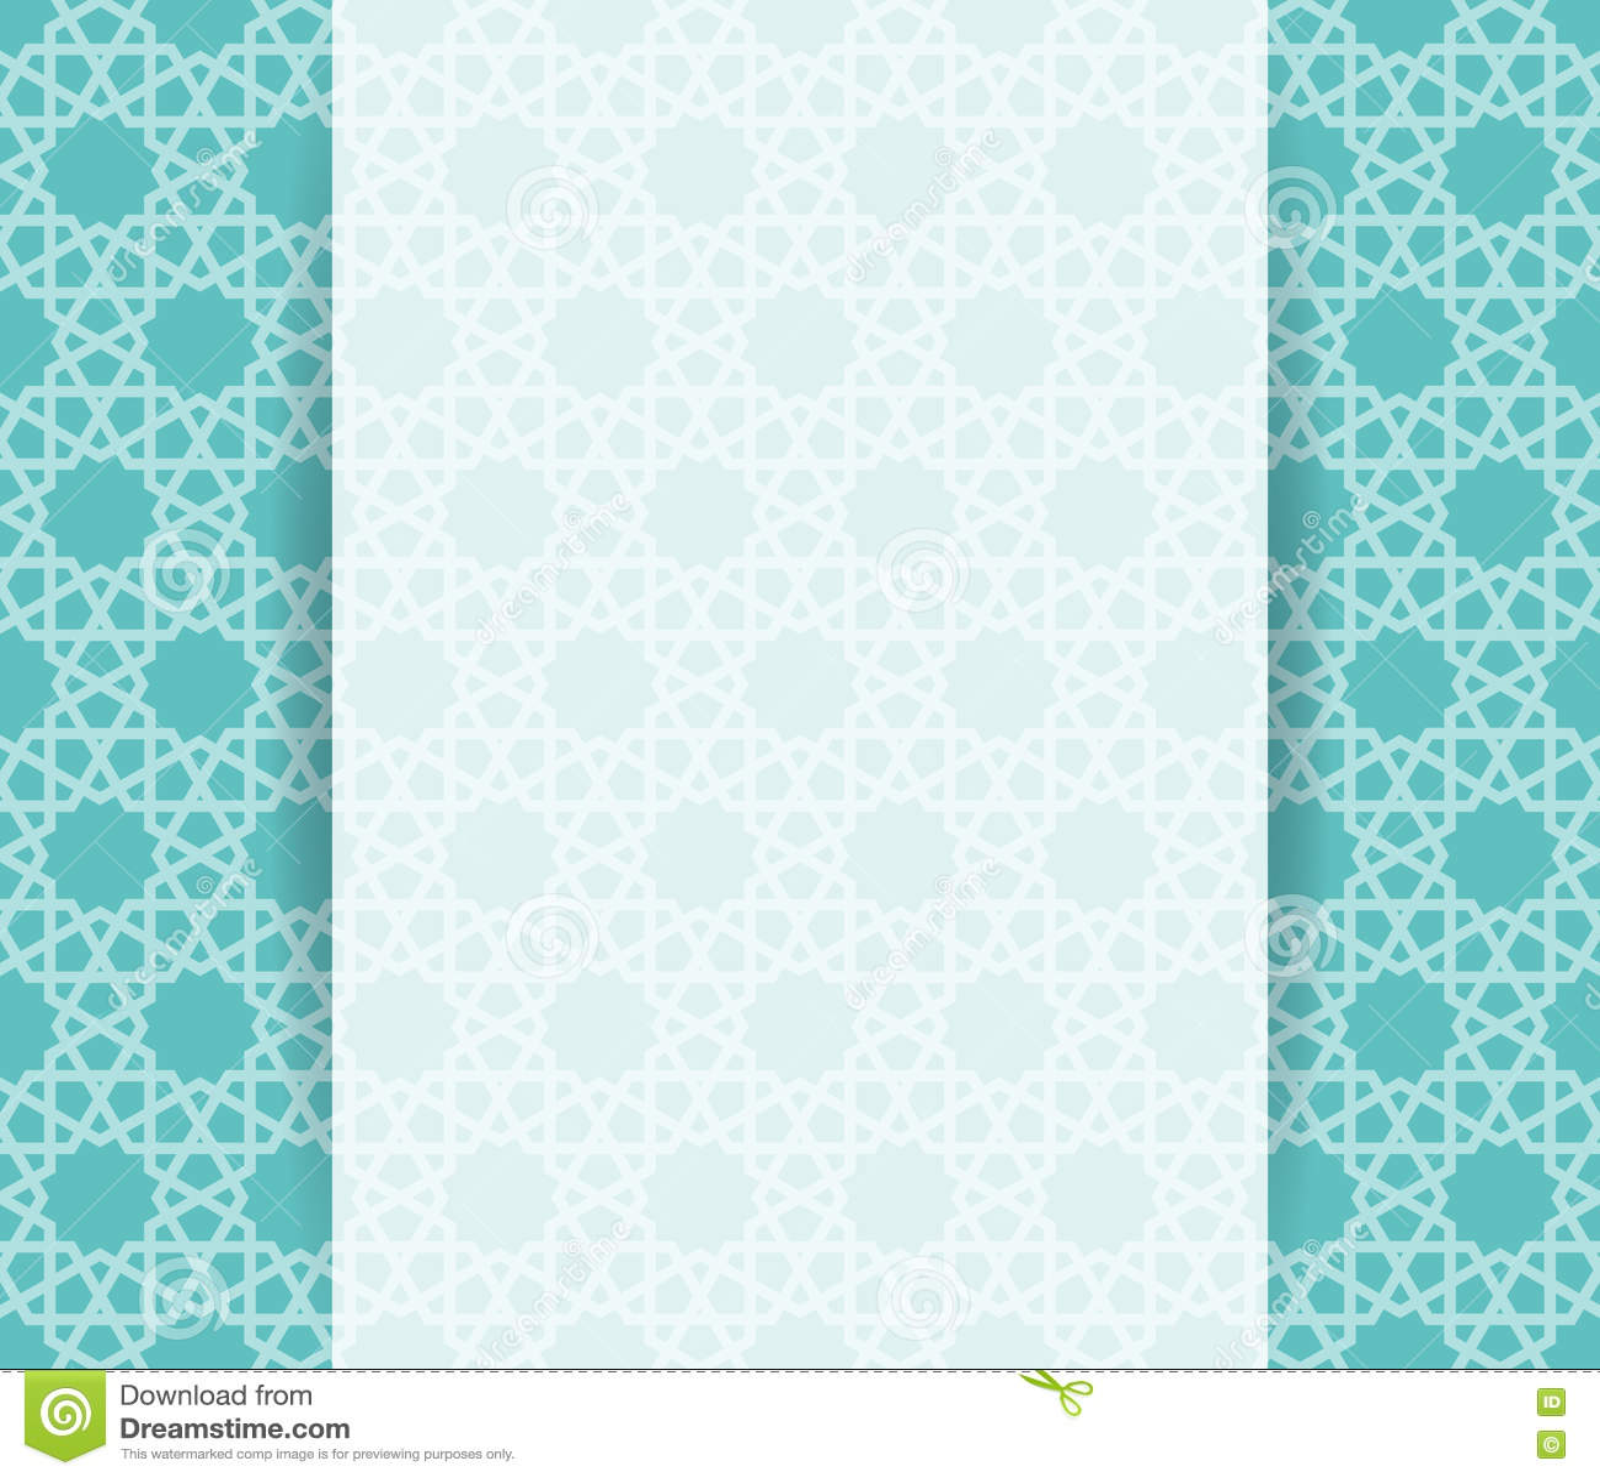 Islamic brochure vector stock vector illustration of for Islamic brochure design